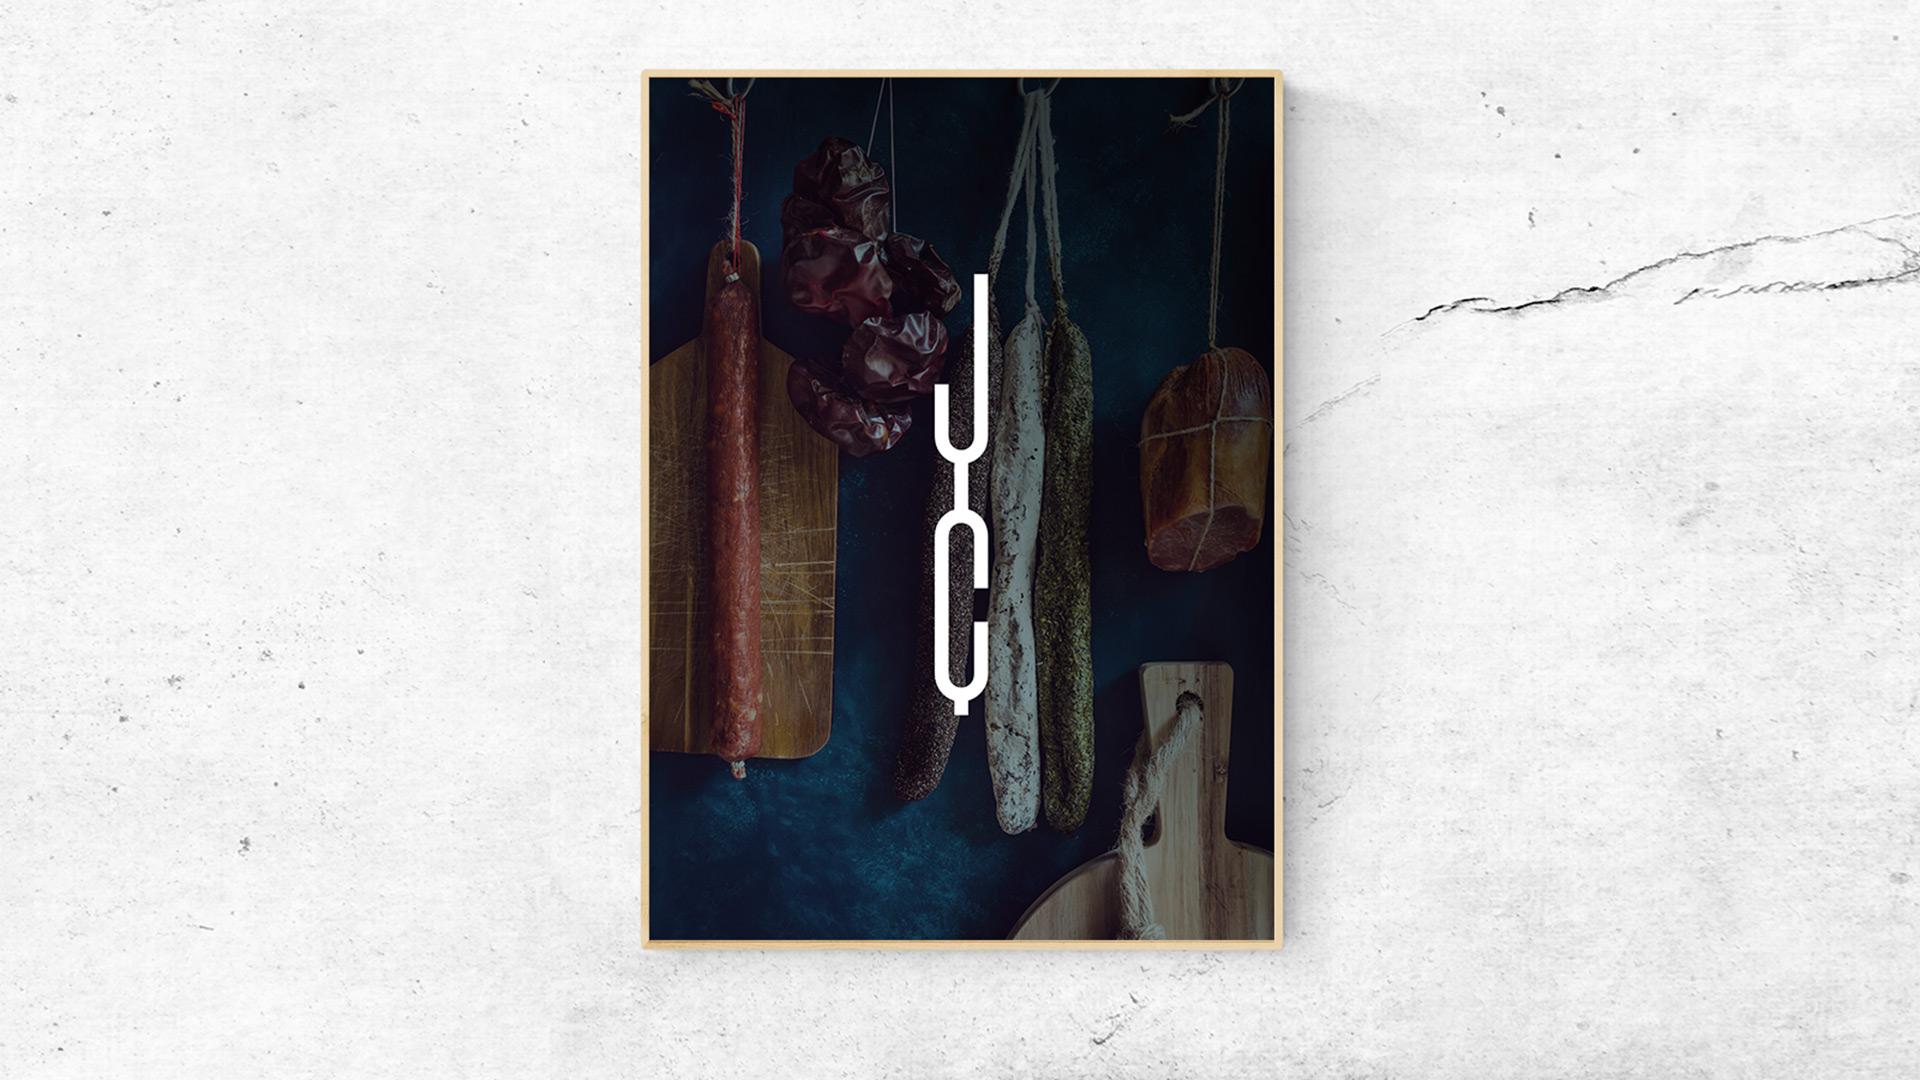 Jepson Charcuteri - Visuel Identitet - Plakat 2